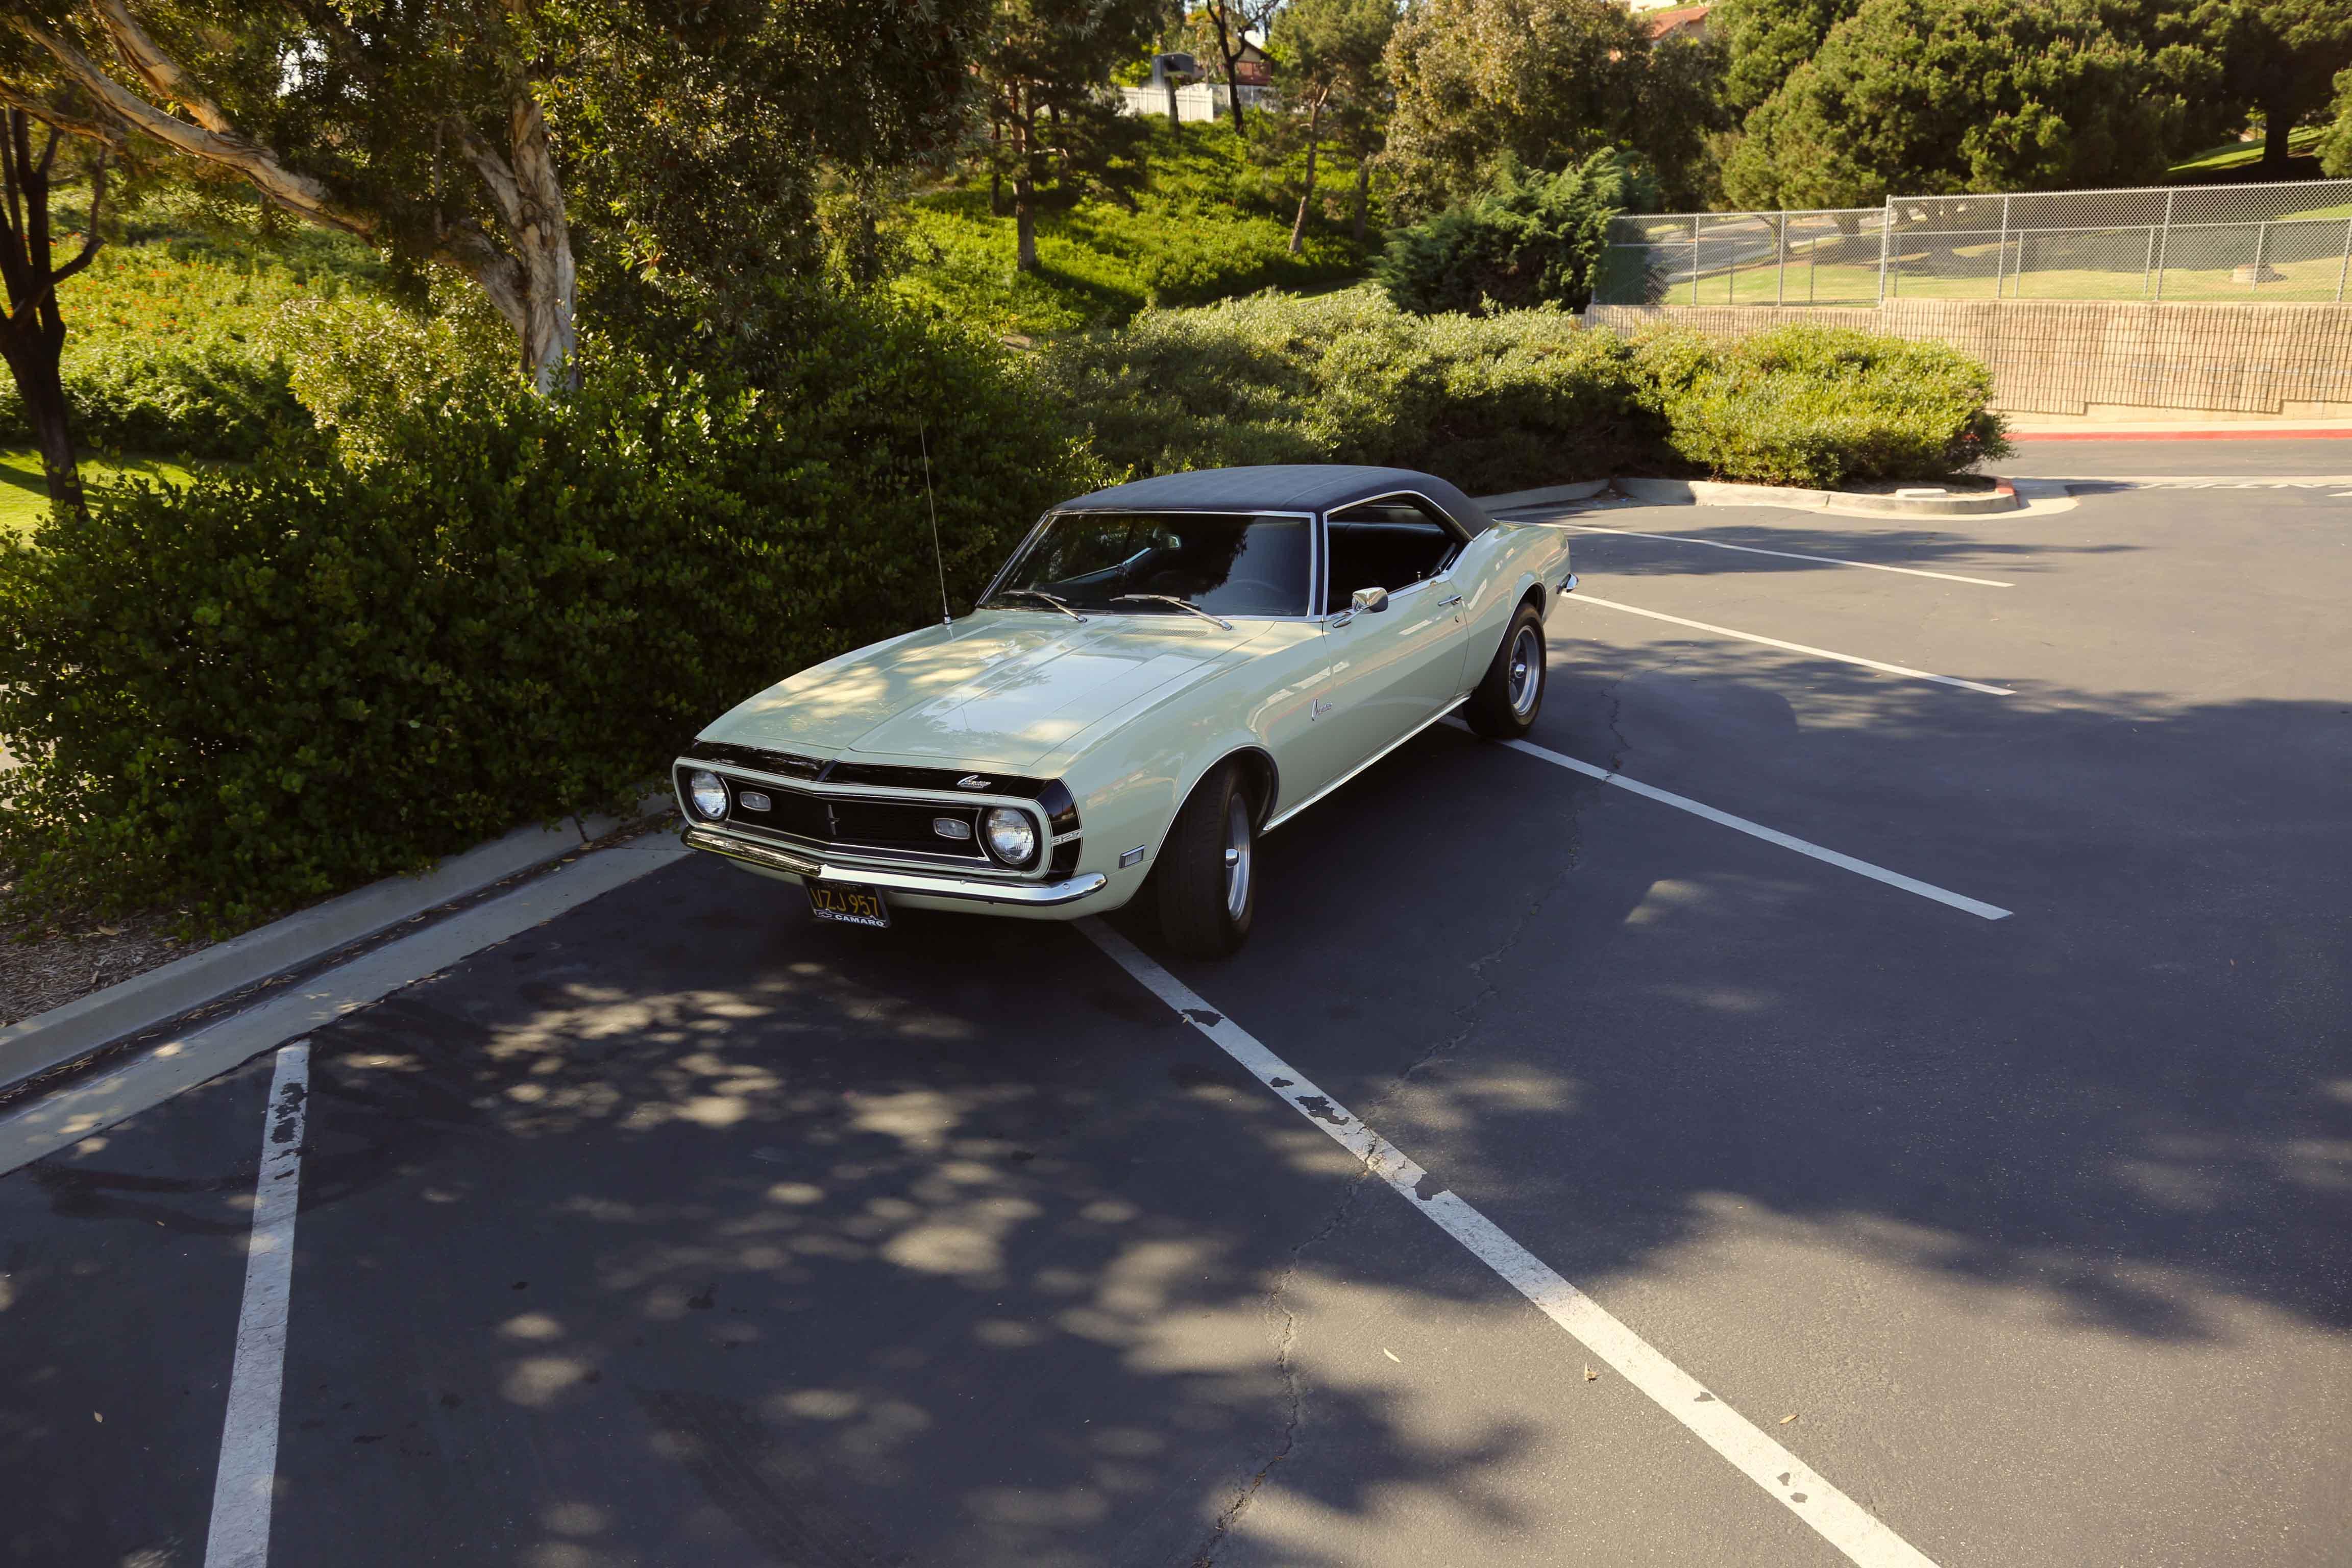 1968 Camaro Odd Options Front 3/4 high